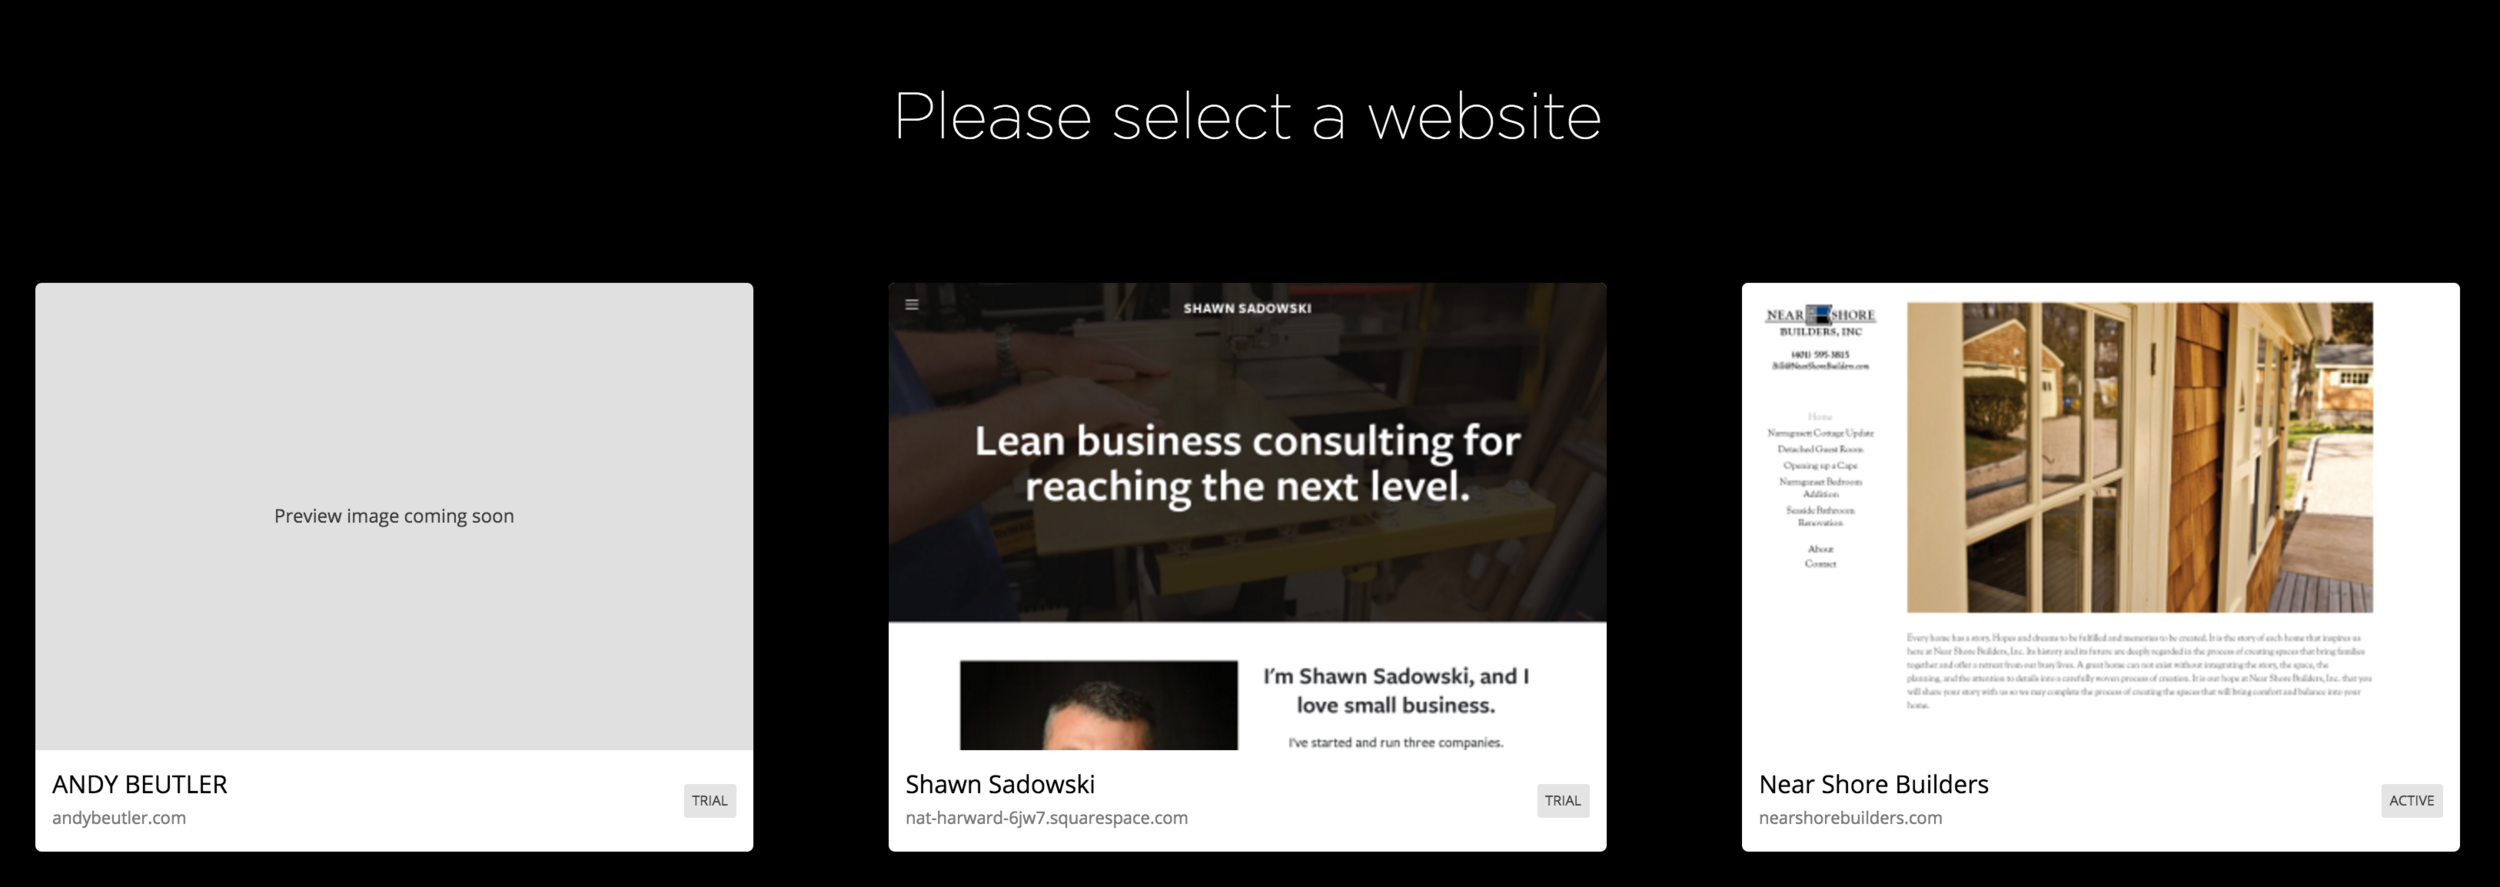 squarespace-form-alerts-login-select